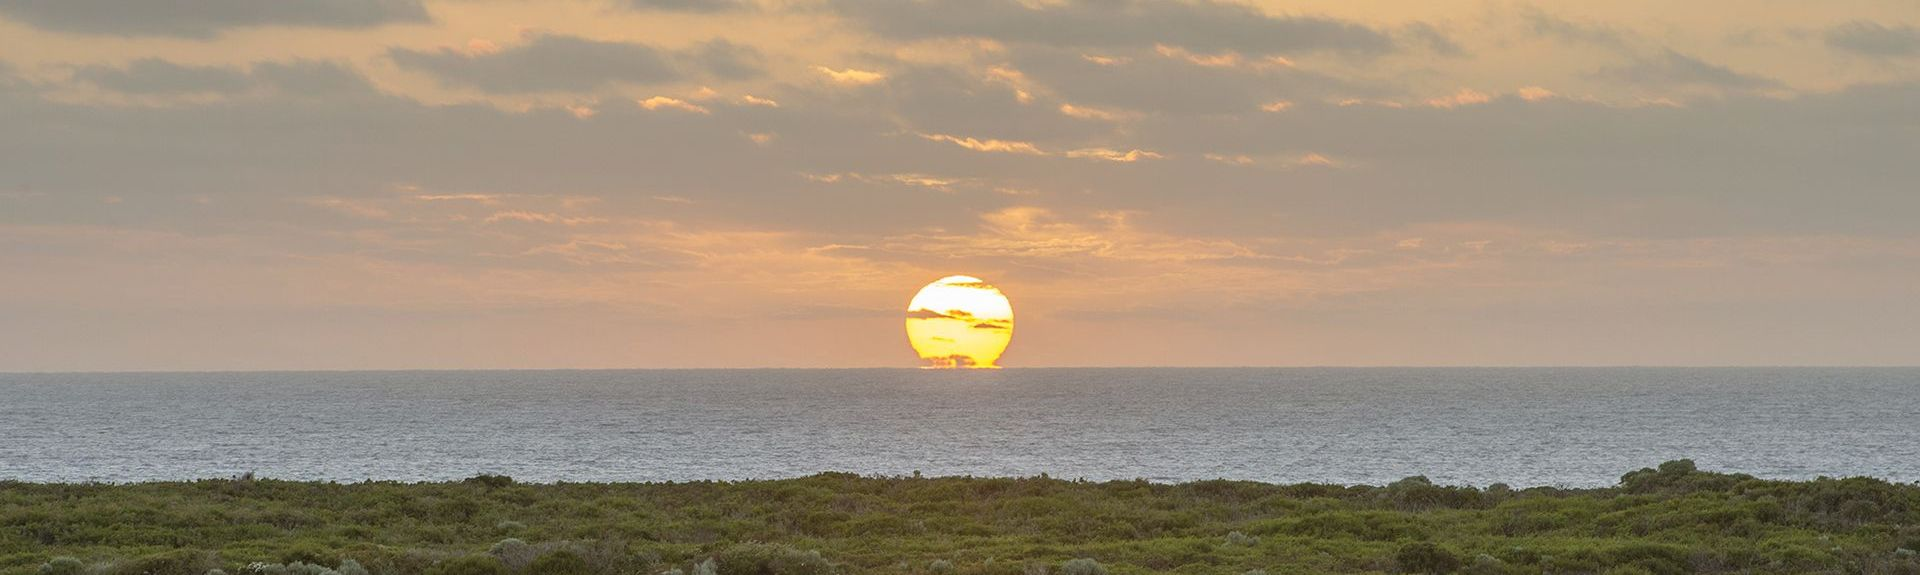 Forest Grove, Australie-Occidentale, Australie